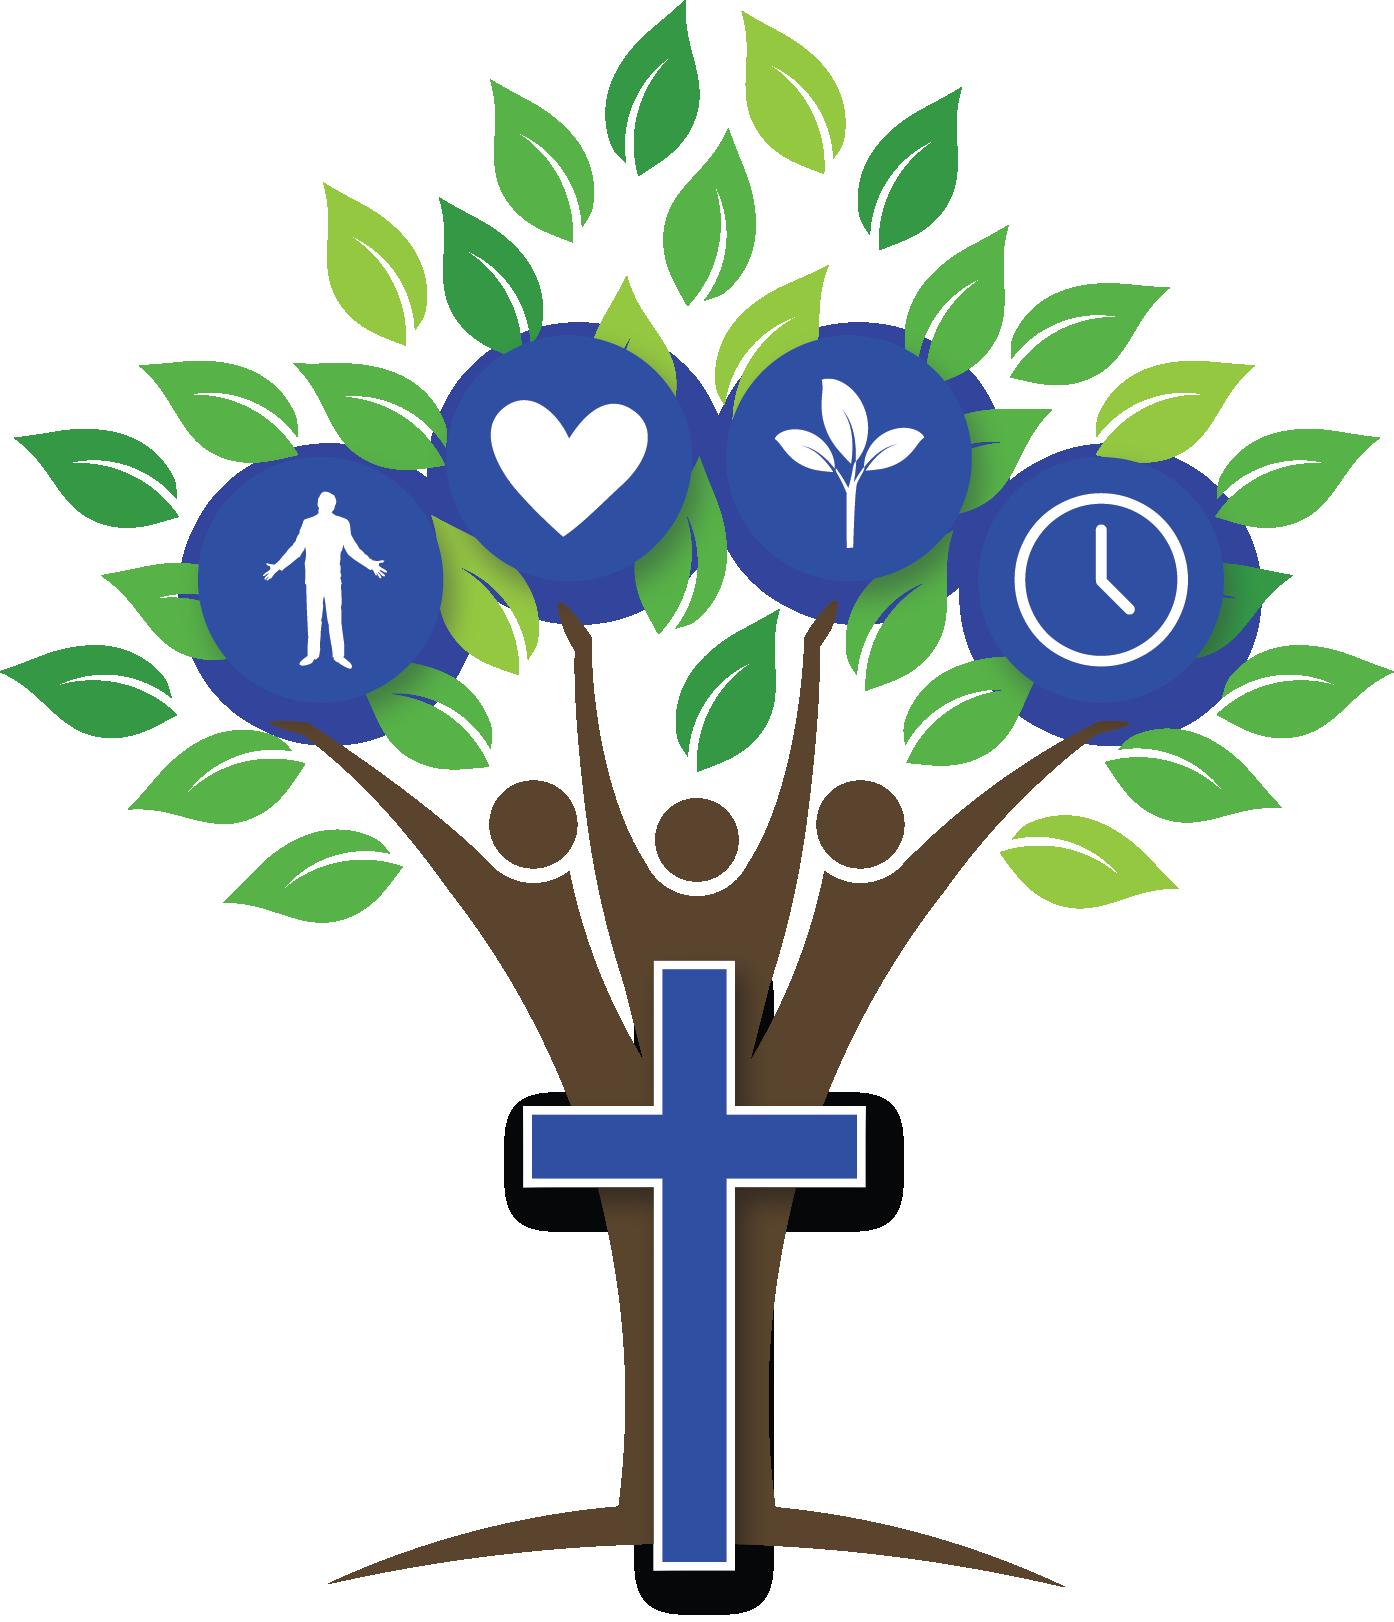 Susquehanna Valley Parish - Future Sermon Topics